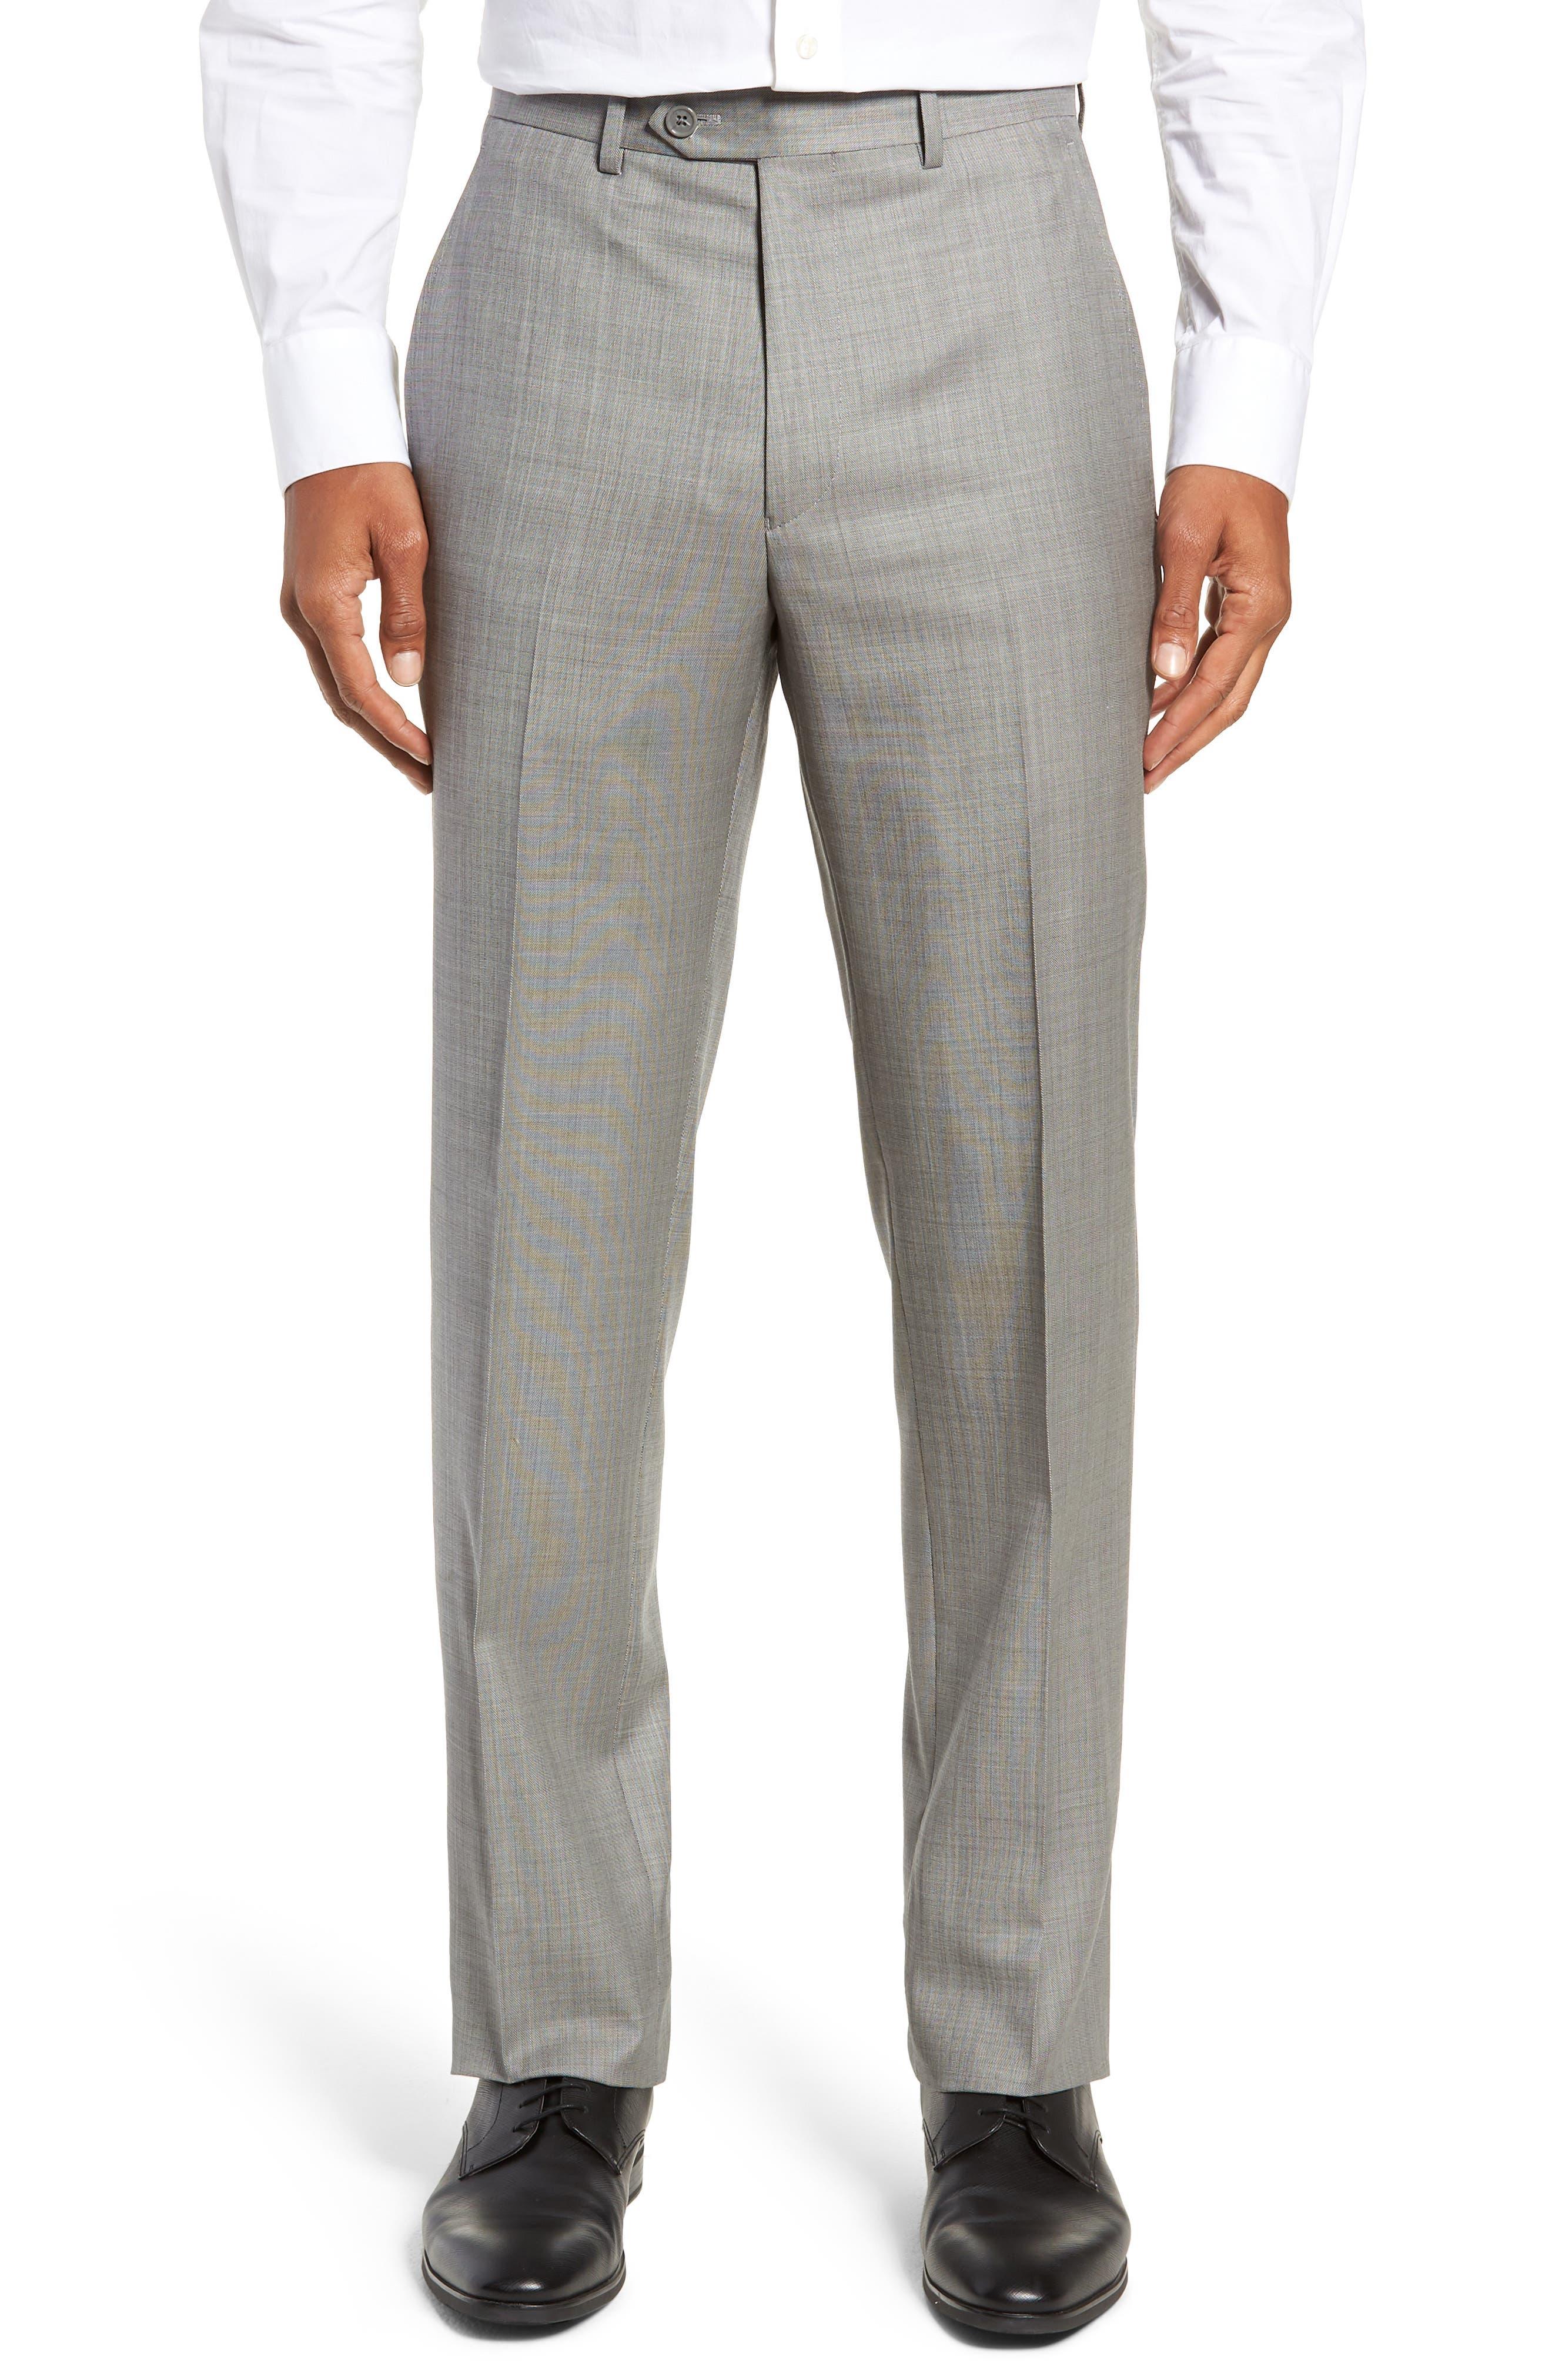 Image of Santorelli Flat Front Sharkskin Wool Trousers